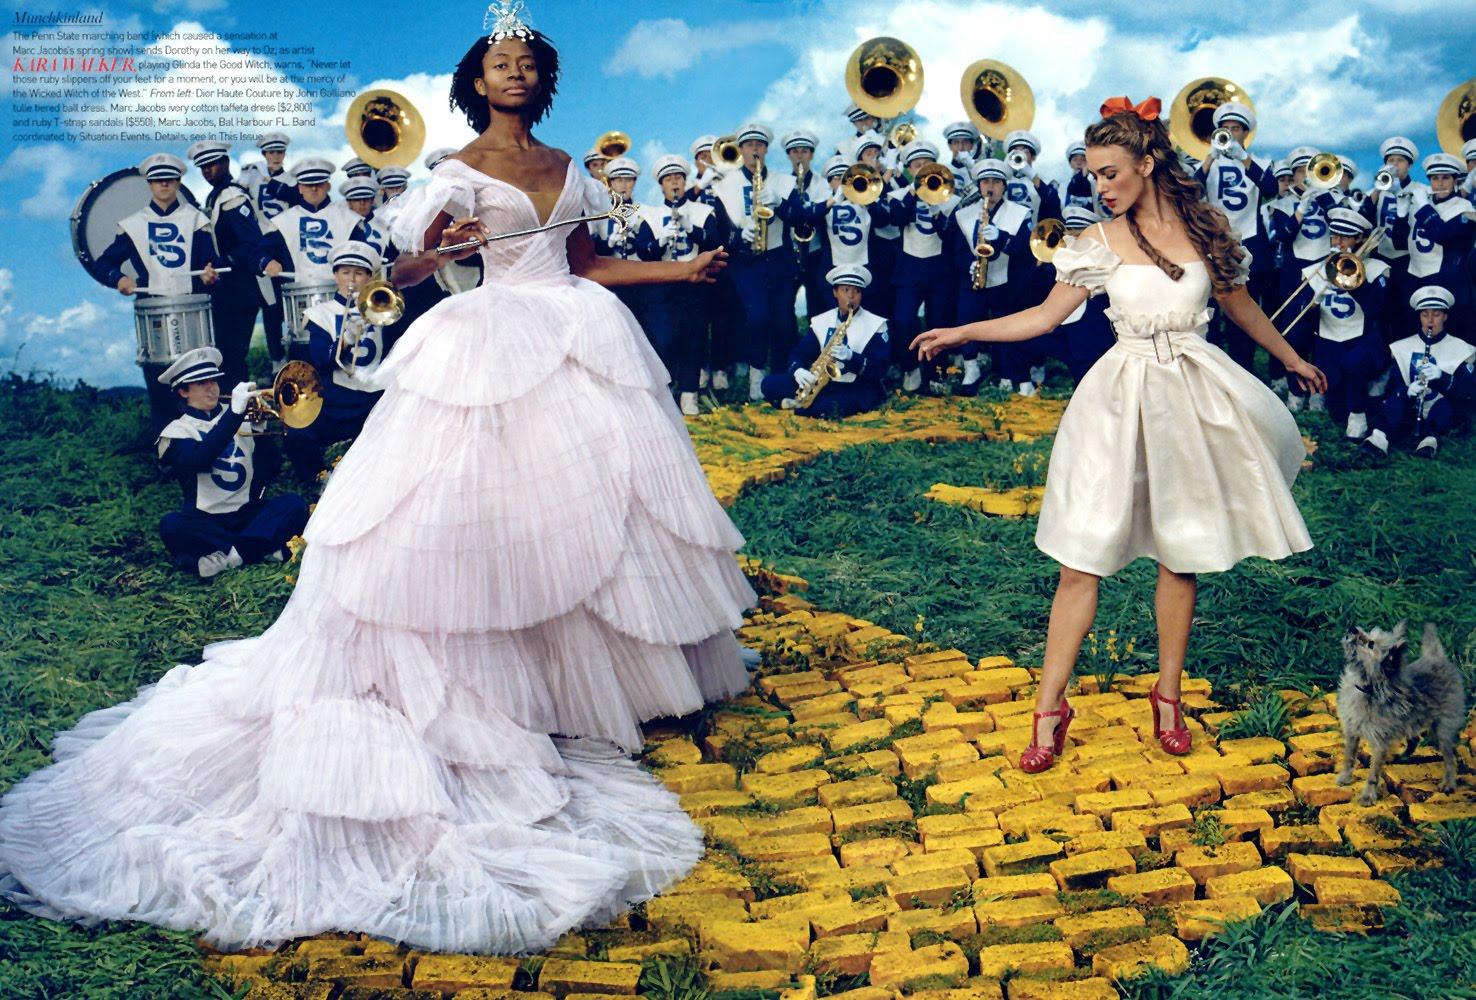 http://1.bp.blogspot.com/_bq6_cE4BJJQ/TAz2eAyCCtI/AAAAAAAAY4E/Da9wv2u1vnY/s1600/Annie+Leibovitz+%C3%97+Keira+Knightley+-+US+Vogue+December+2005+-+The+Wizard+Of+Oz+-+002.jpg